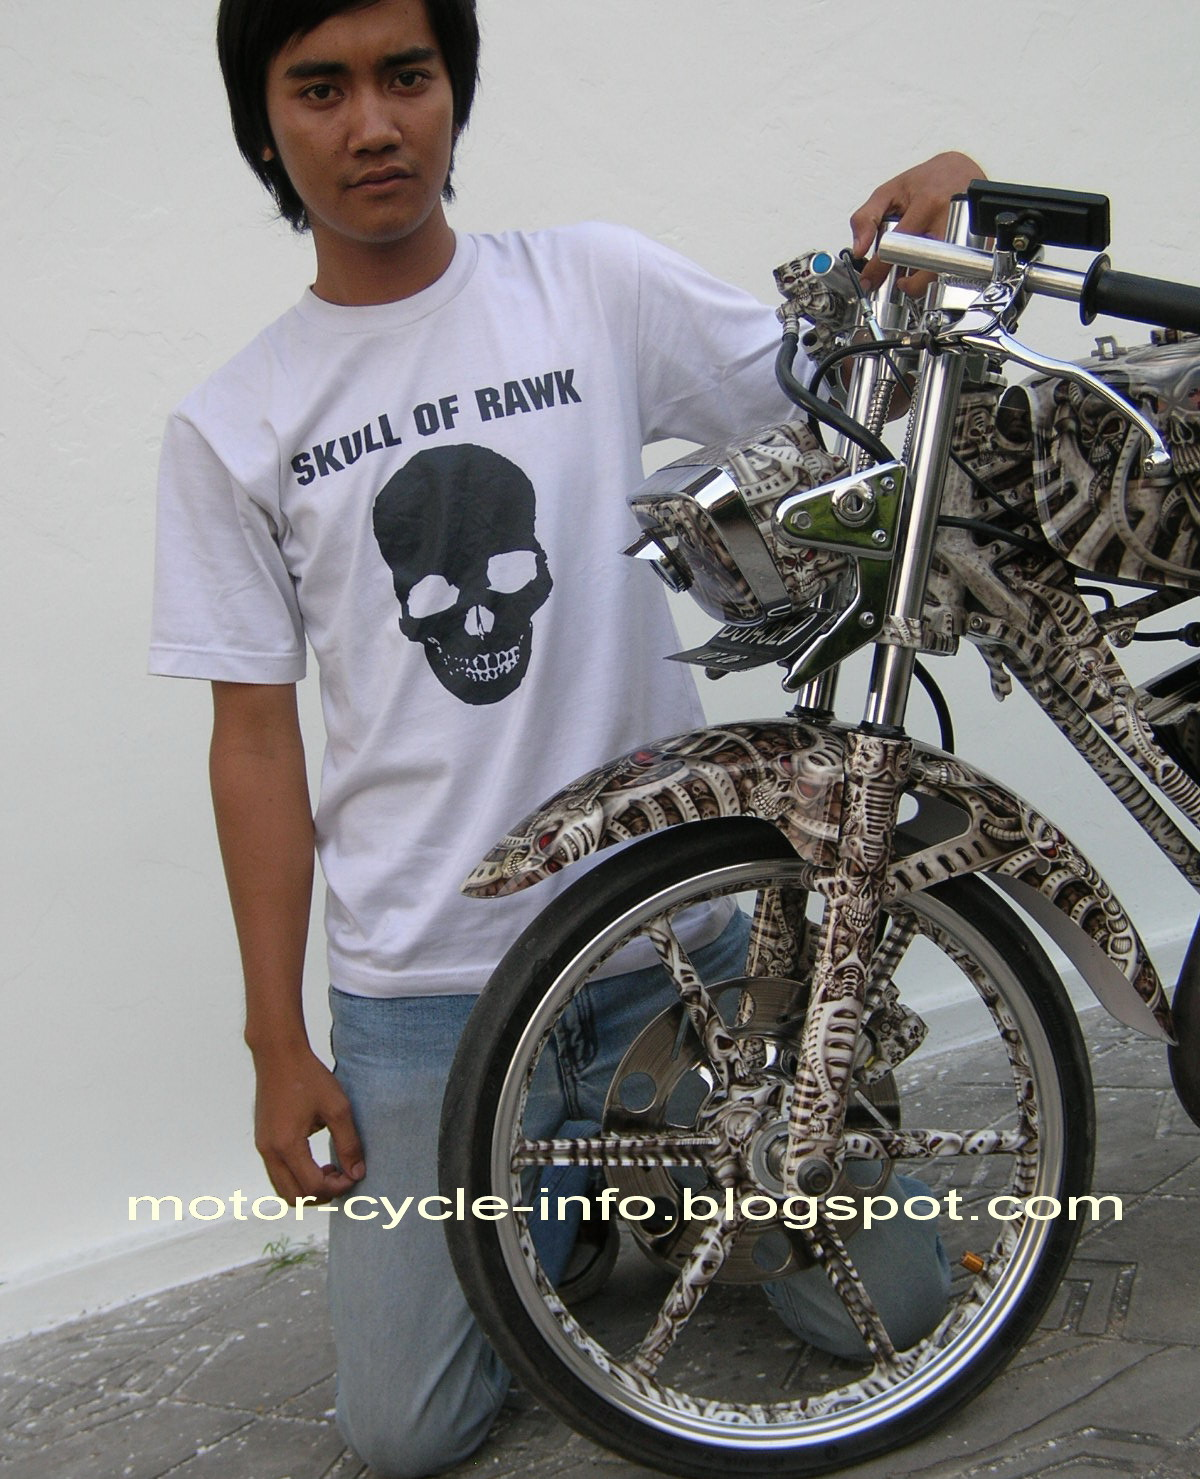 modif YAMAHA RX KING airbrush extreme | motor modif contest | trend ...